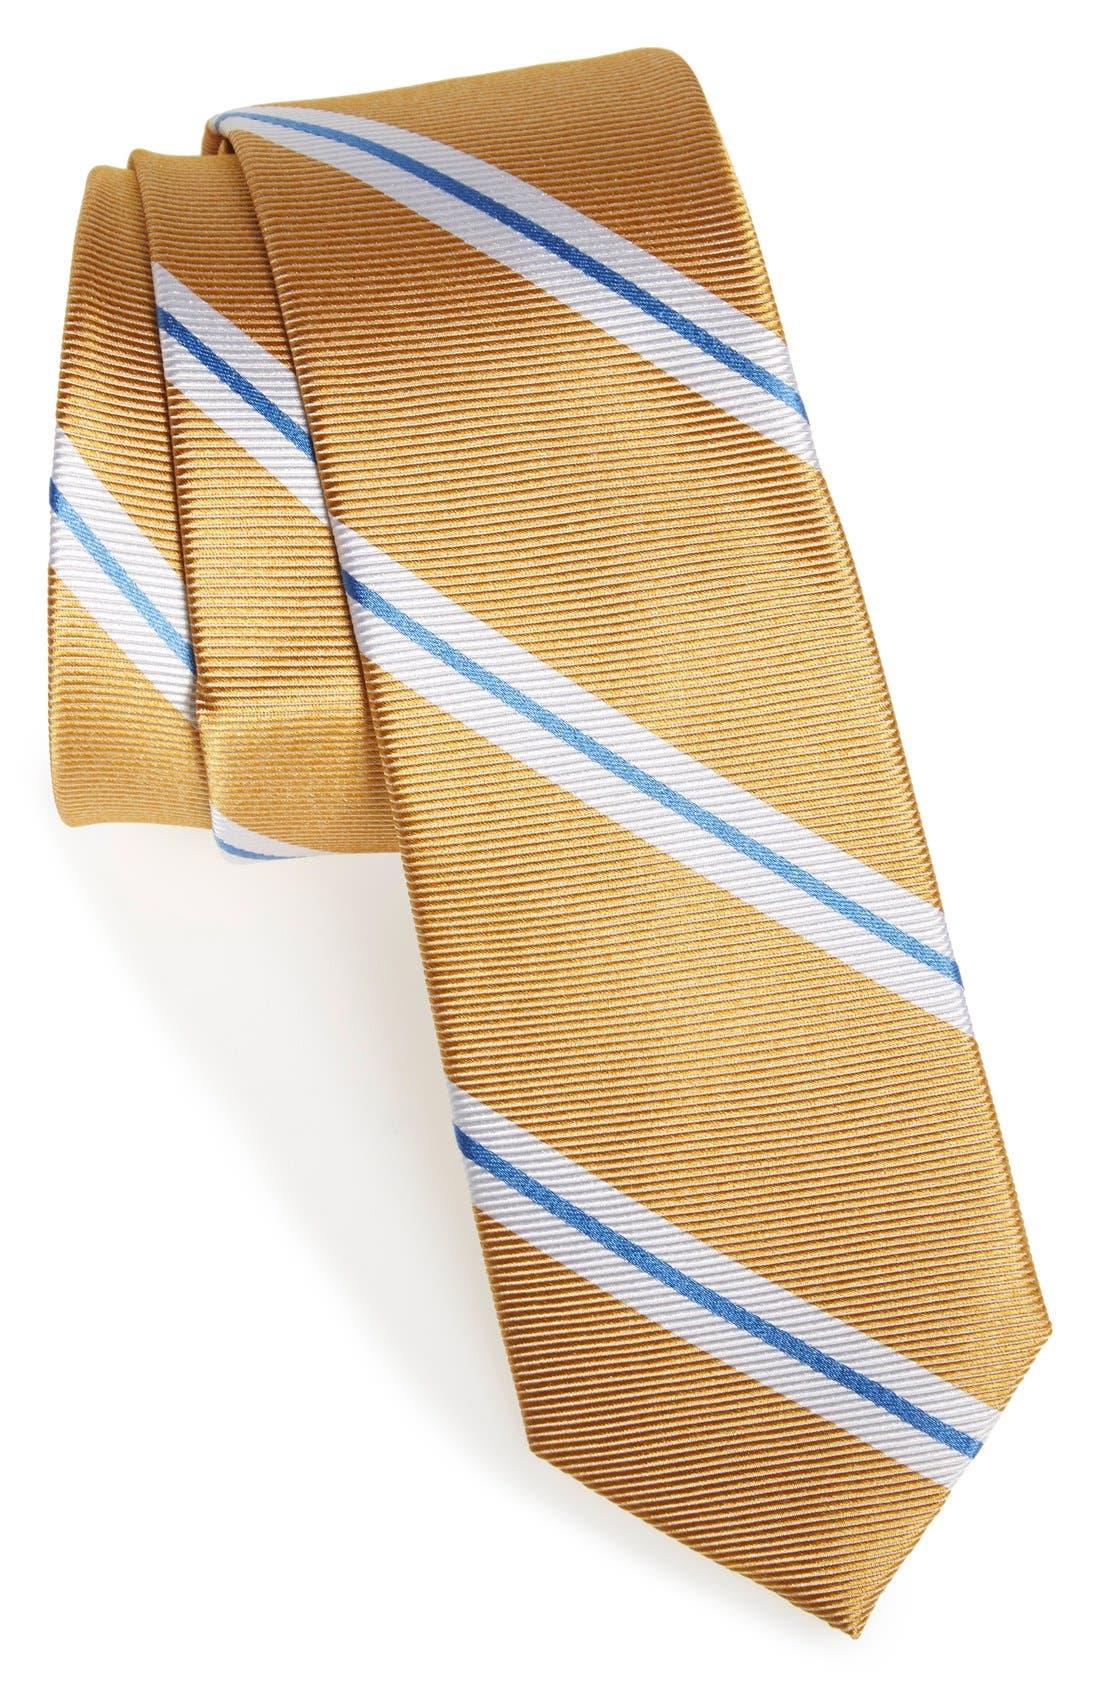 Alternate Image 1 Selected - 1901 'Brolin' Stripe Silk Tie